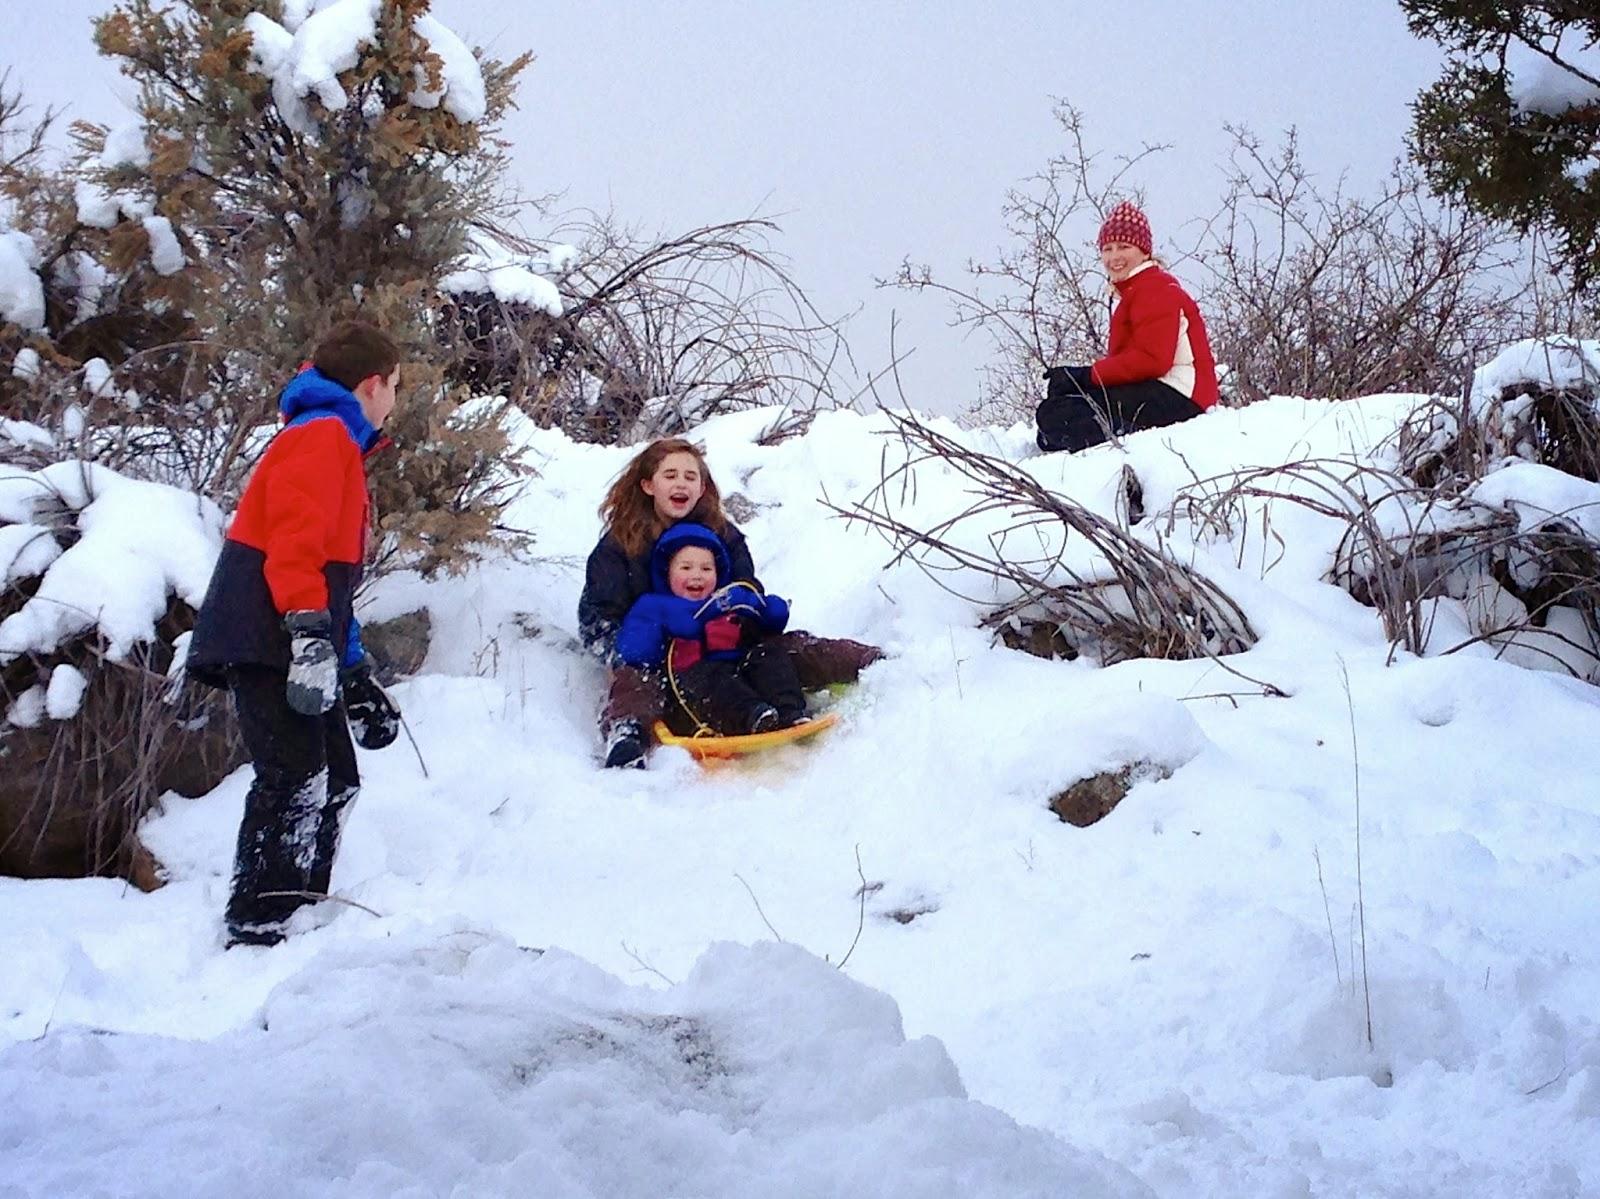 Sledding in Colorado